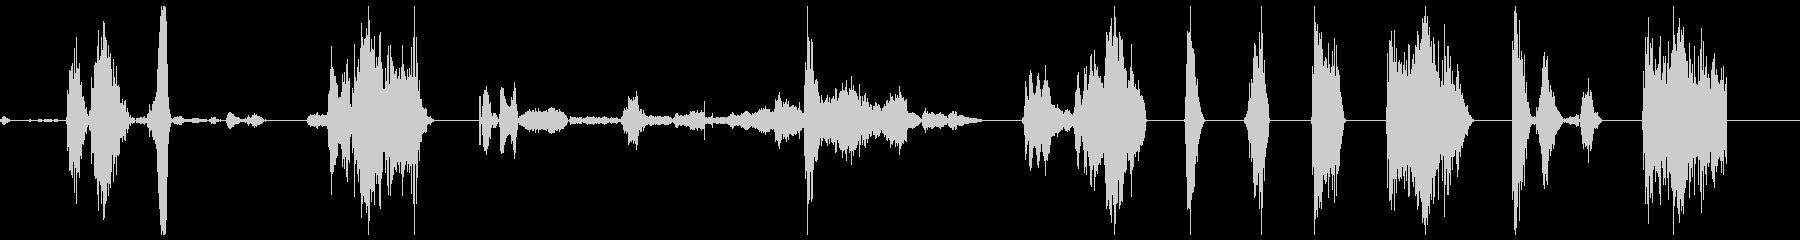 KYMAゾンビ1-10の未再生の波形